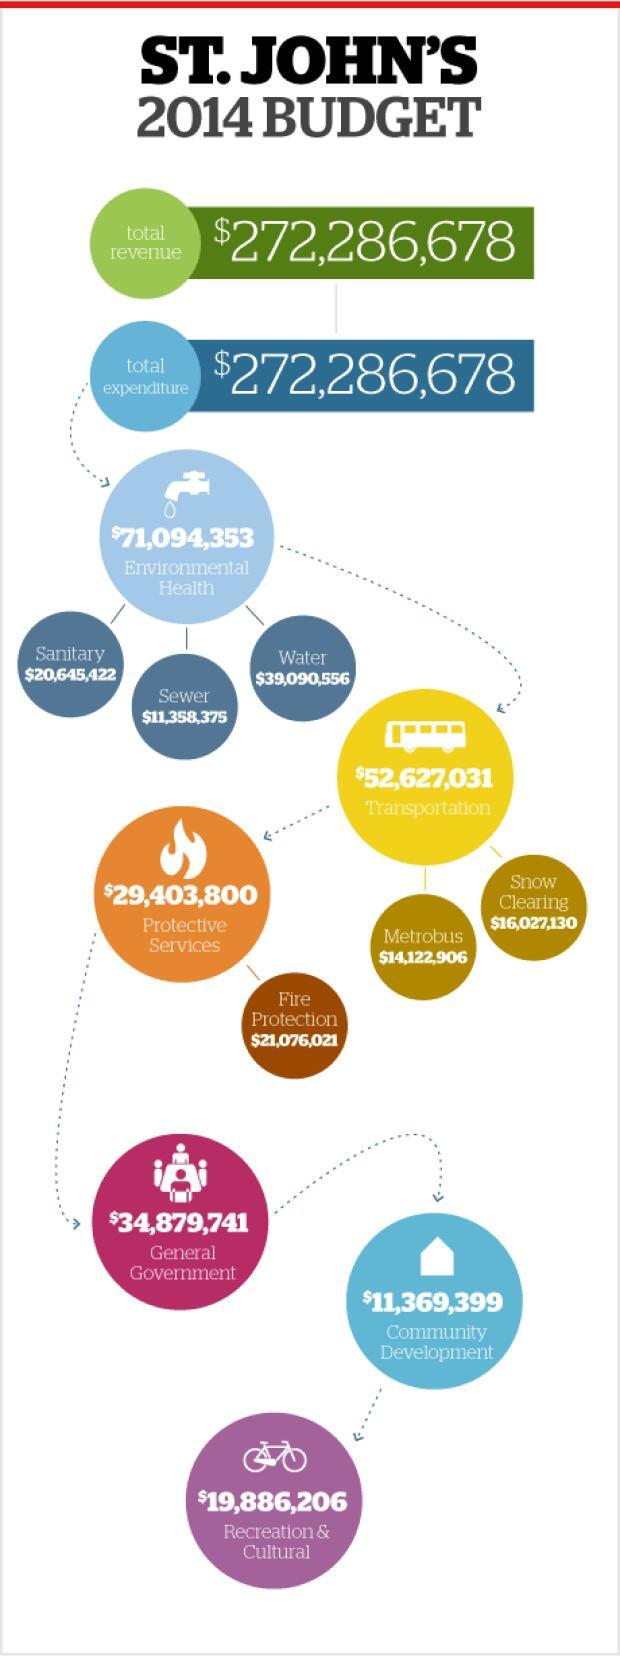 St. John's 2014 budget infographic